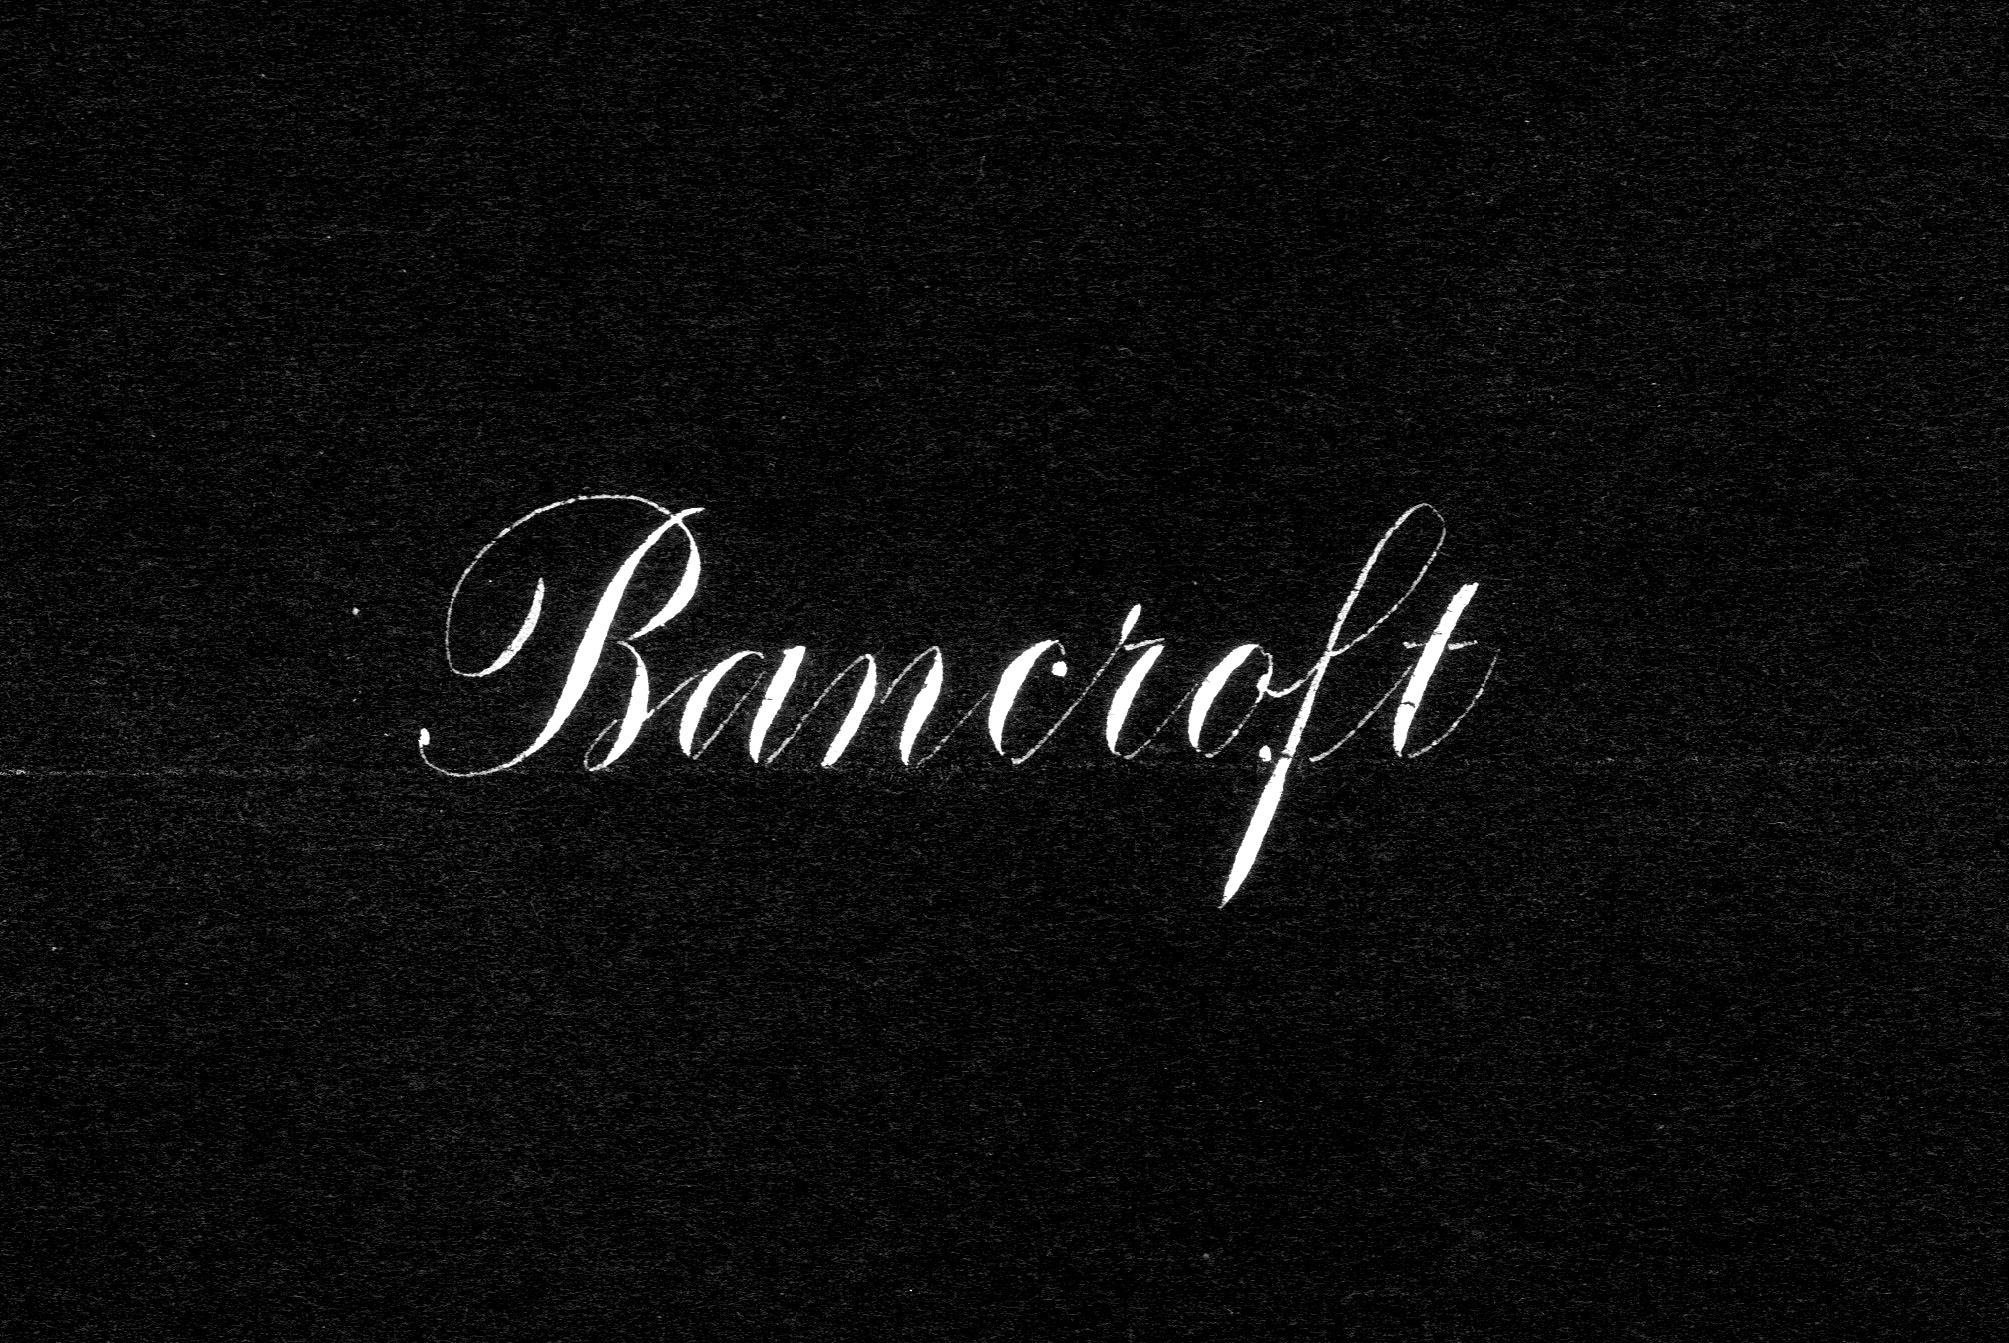 Bancroft.png